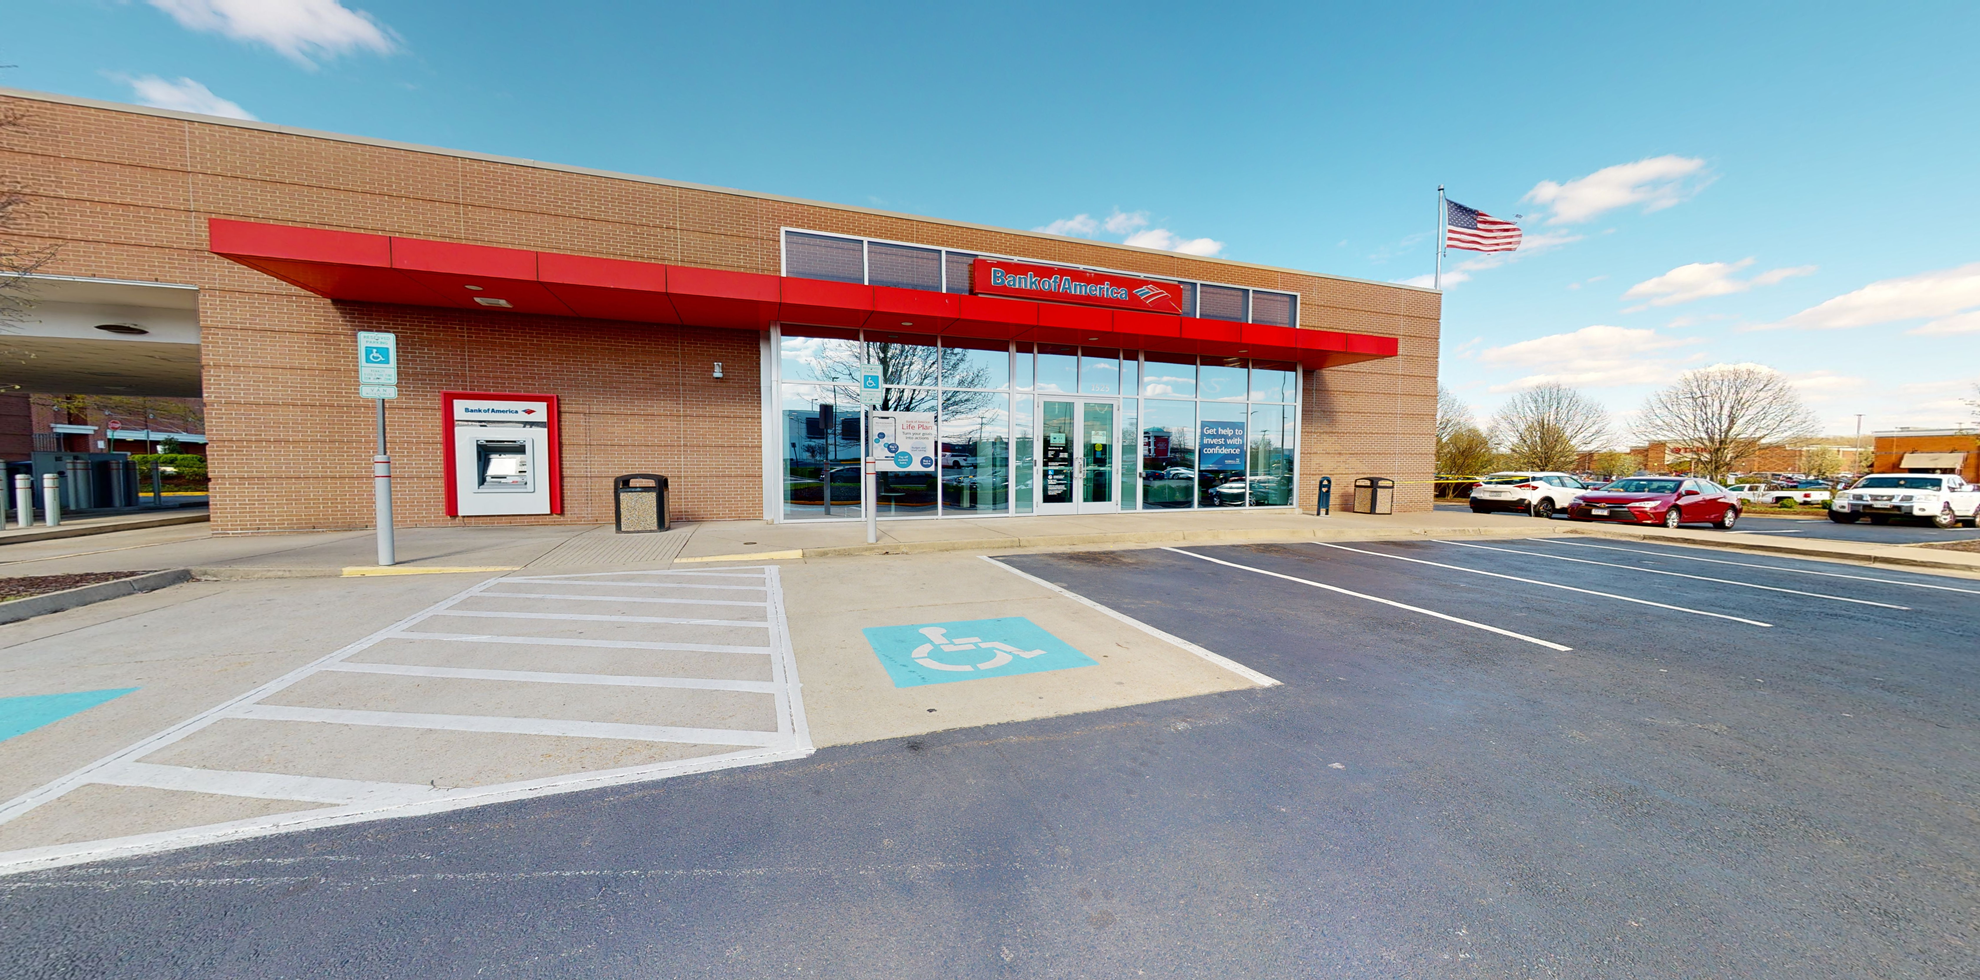 Bank of America financial center with drive-thru ATM | 1525 Stafford Market Pl, Stafford, VA 22556